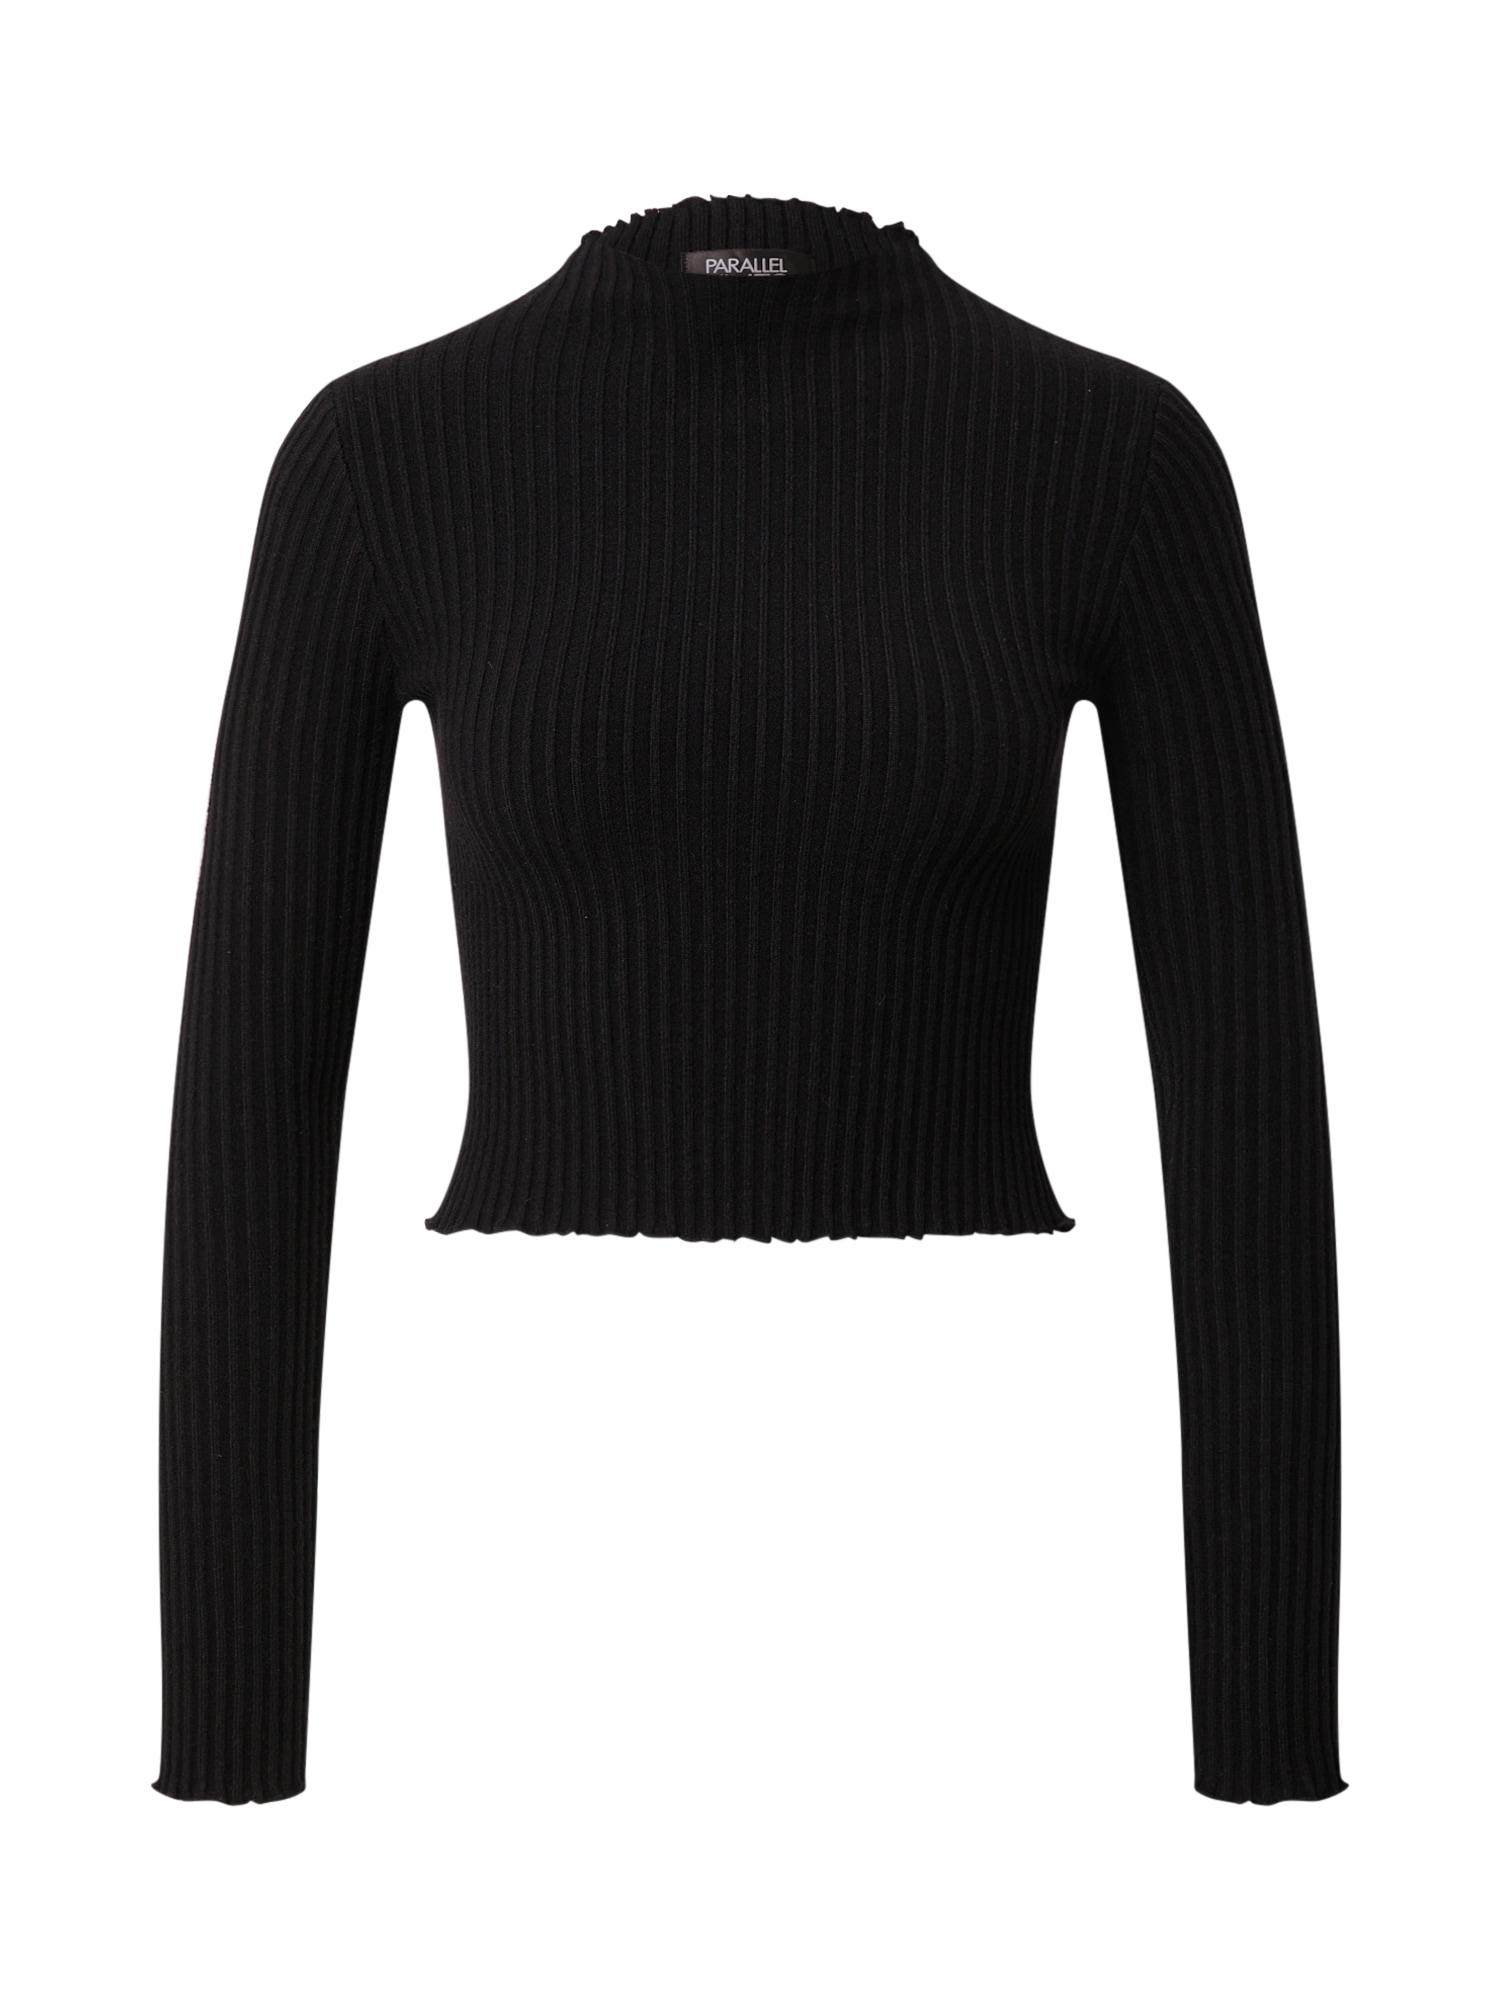 Parallel Lines Megztinis juoda